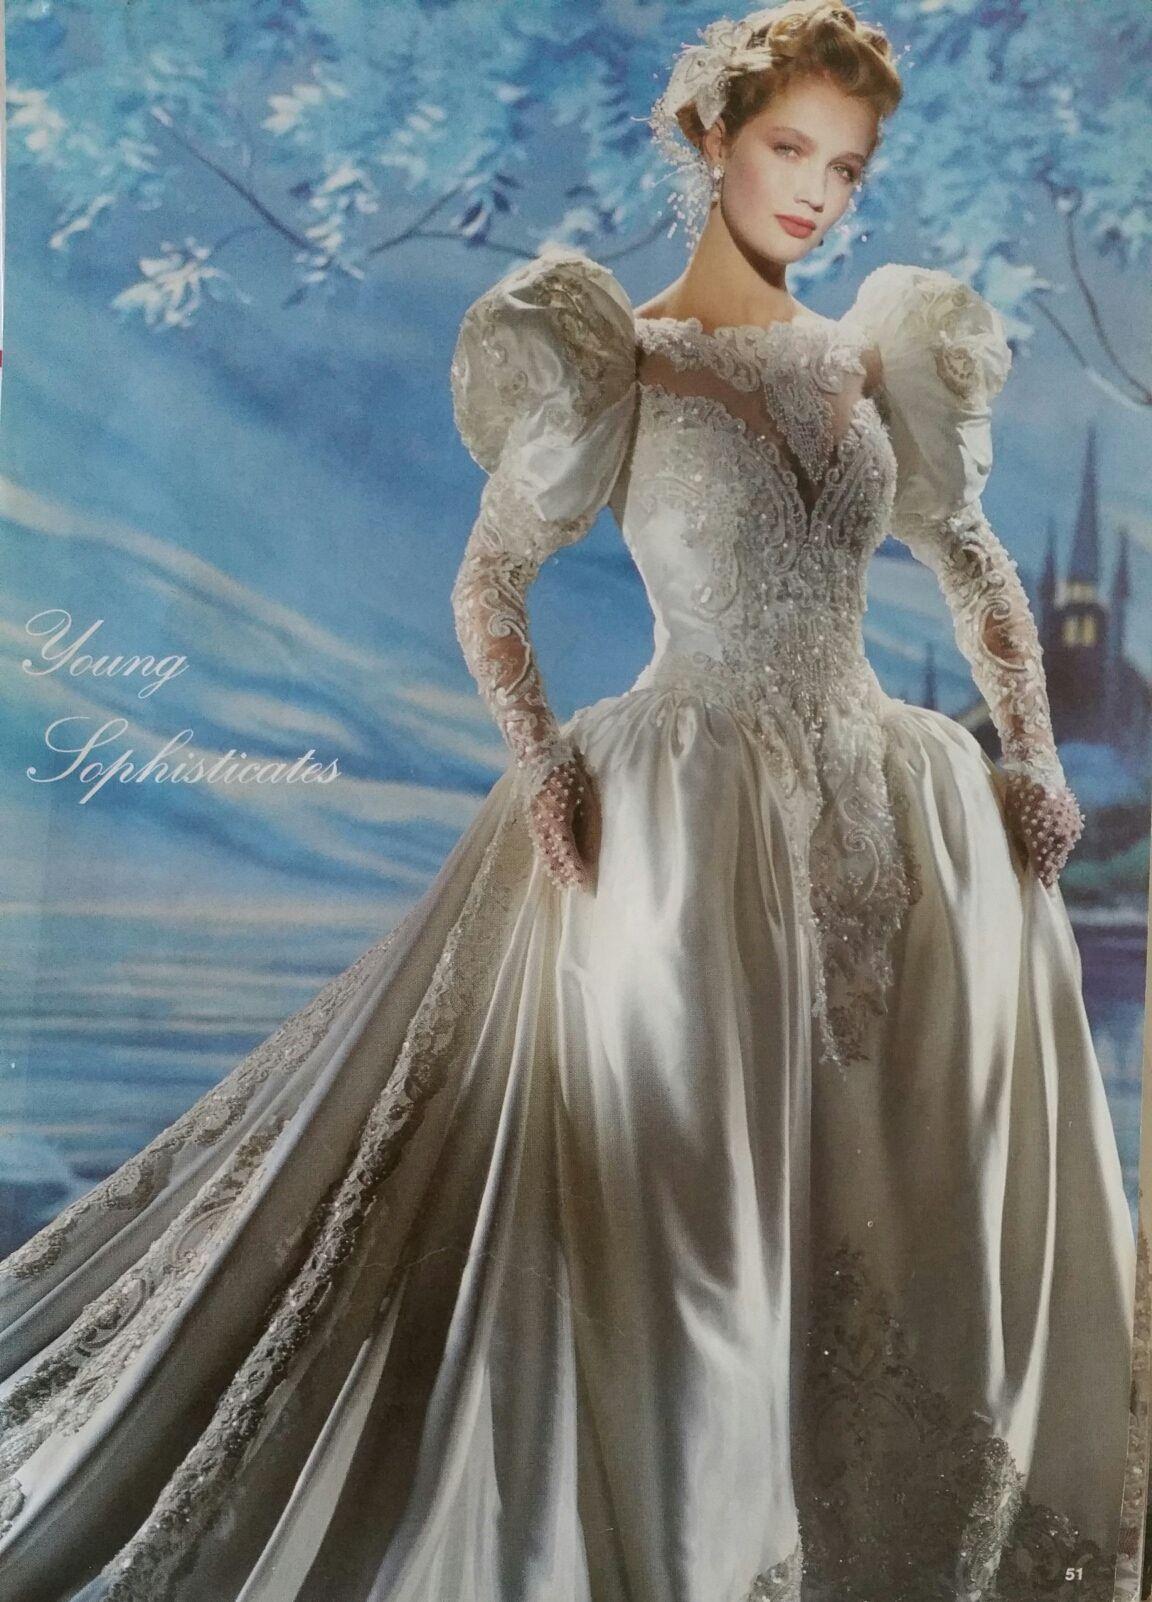 Demetrios Wedding Gowns 023 - Demetrios Wedding Gowns